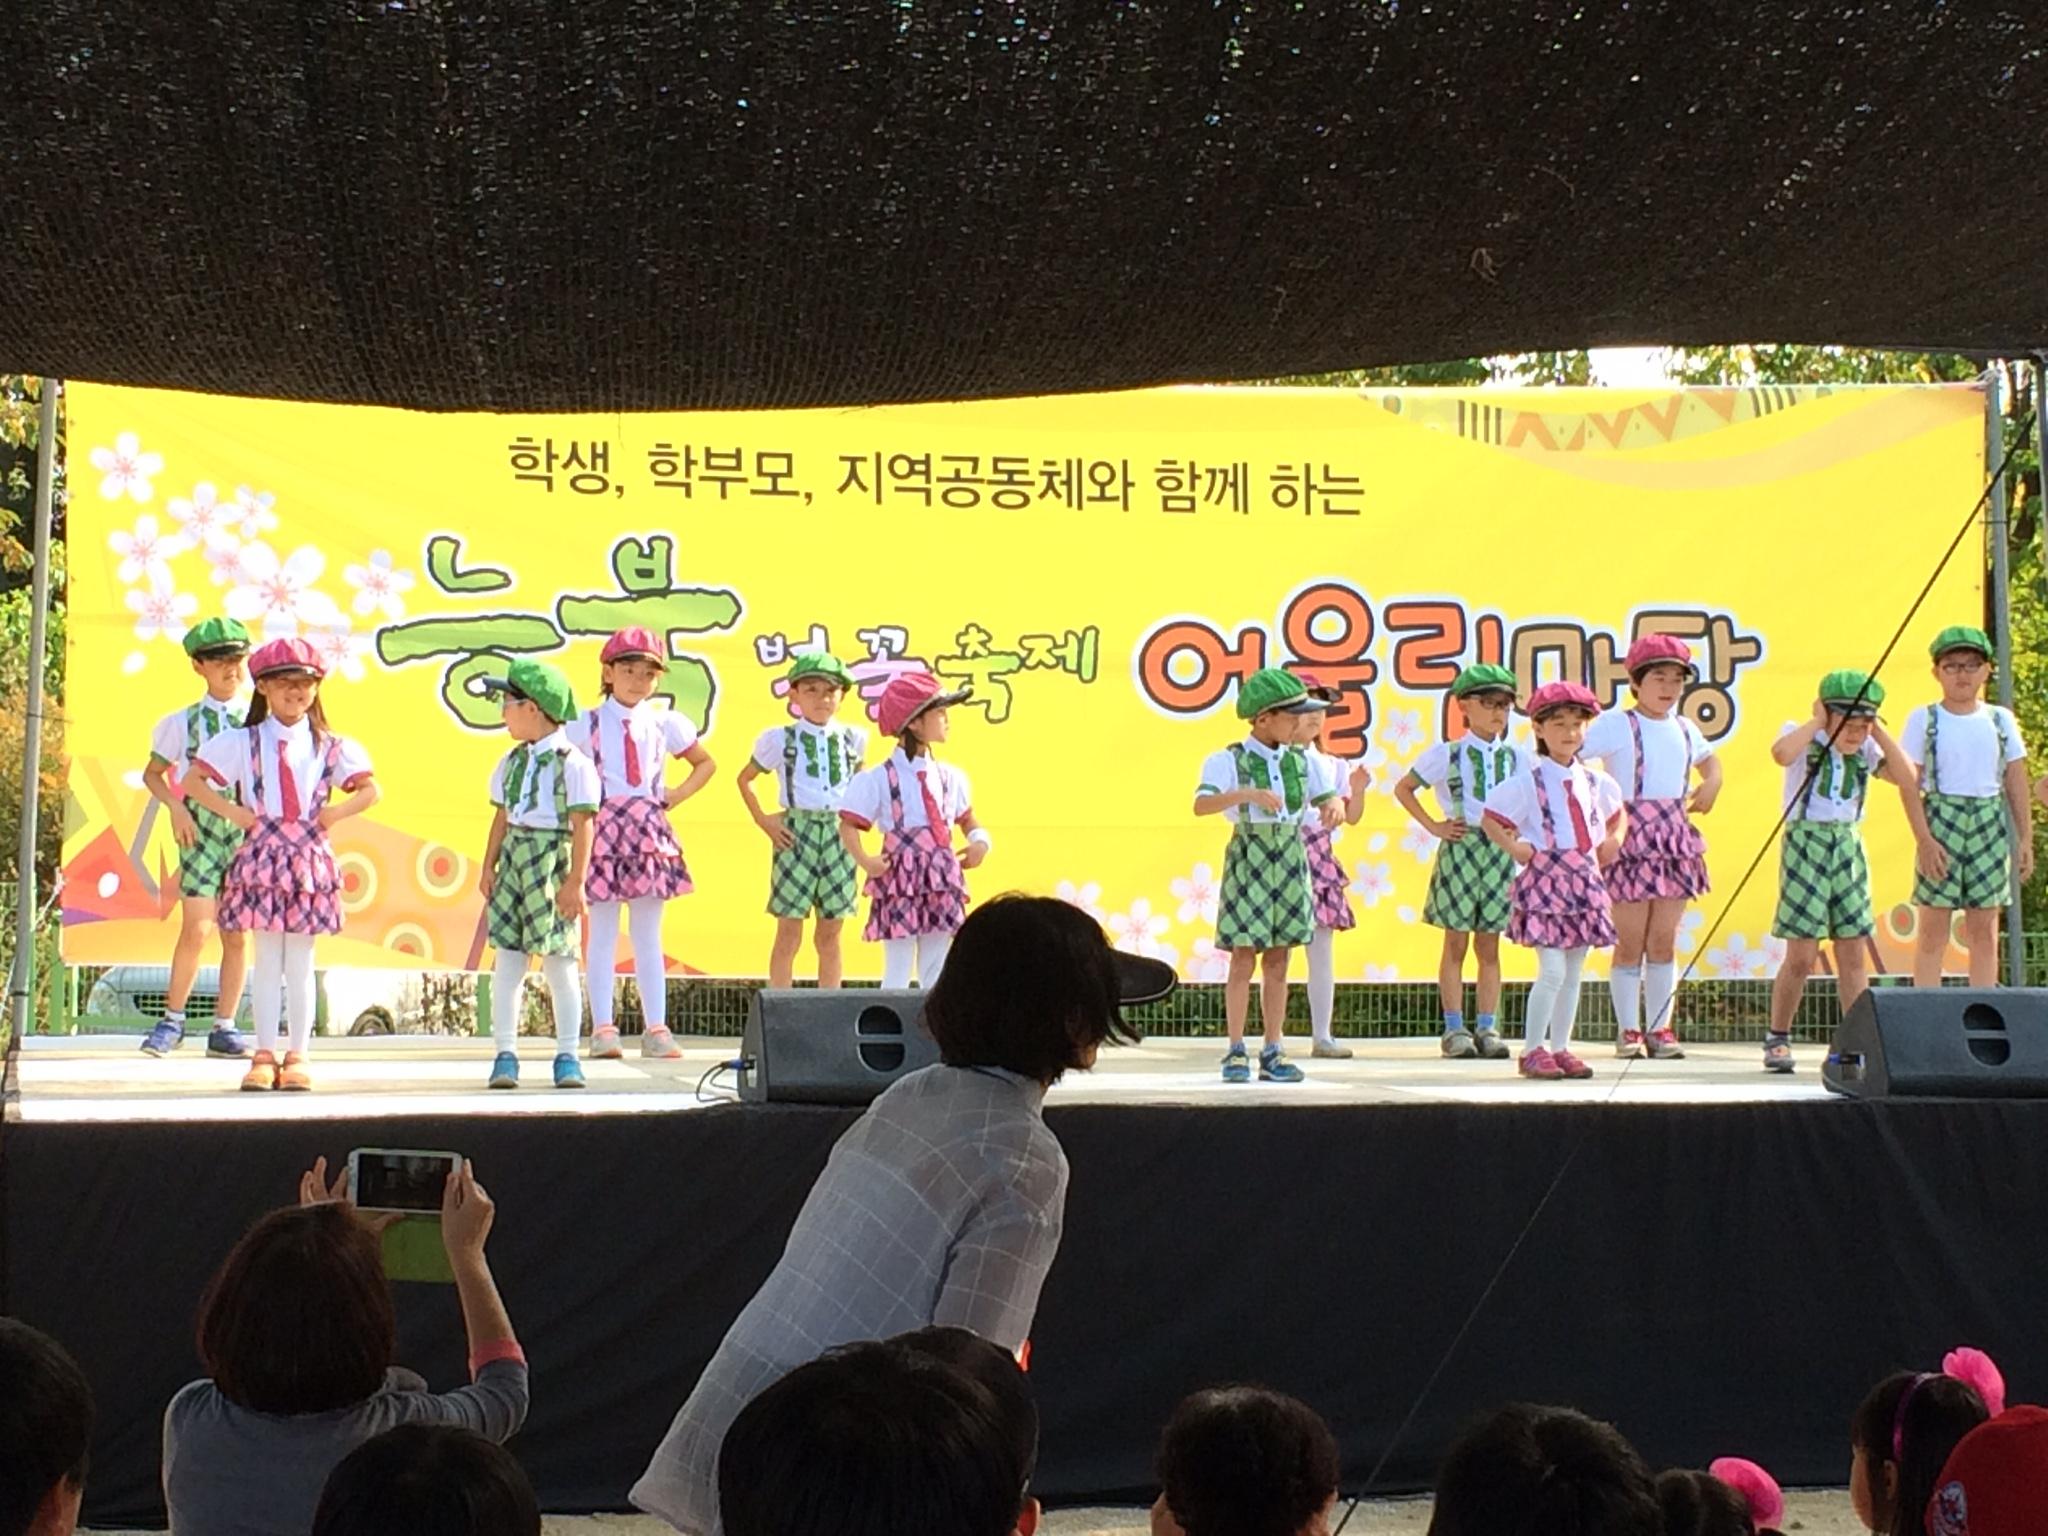 Korean kids performing at their school festival